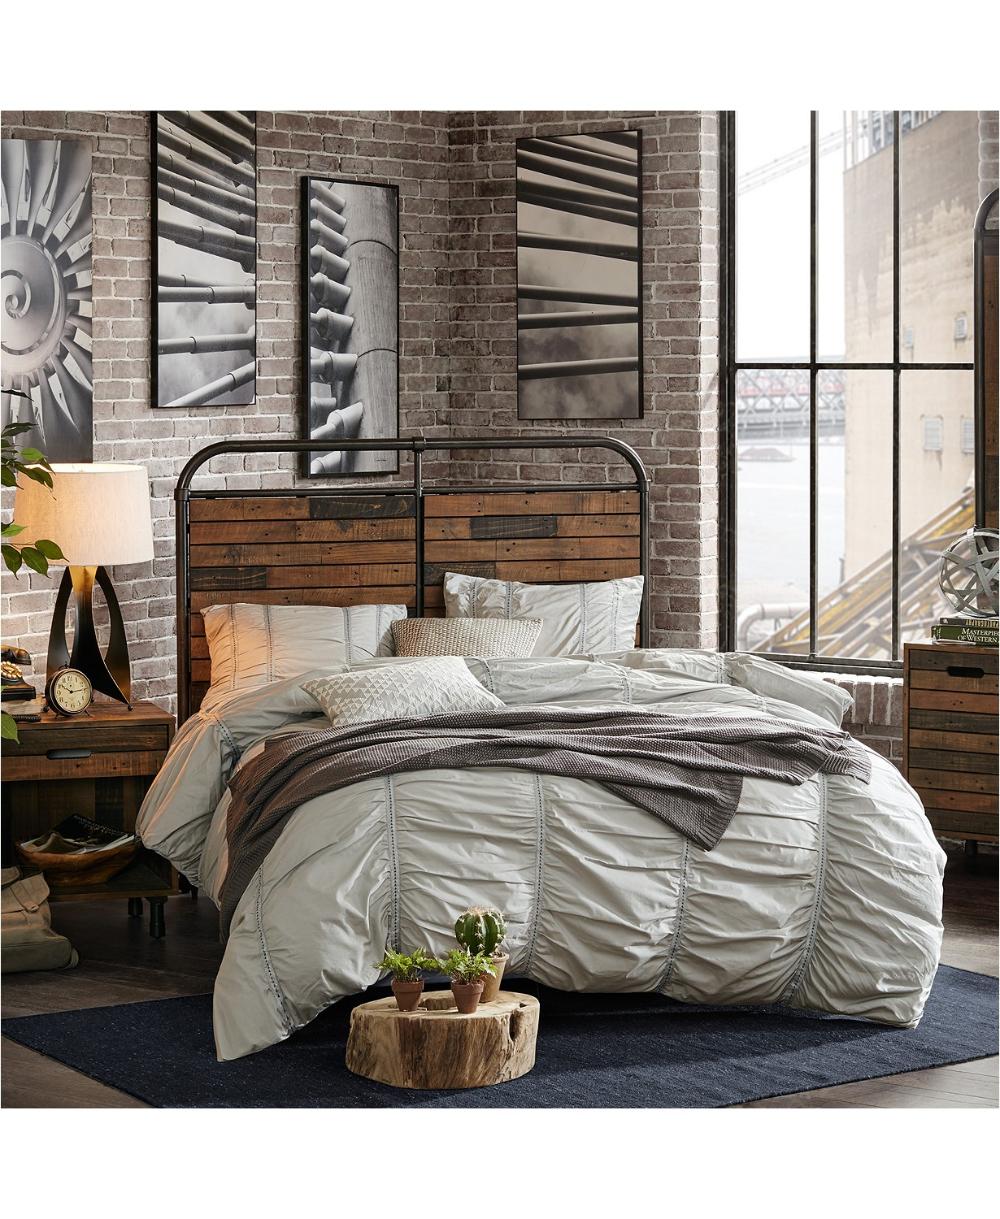 furniture reese queen headboard  reviews  furniture